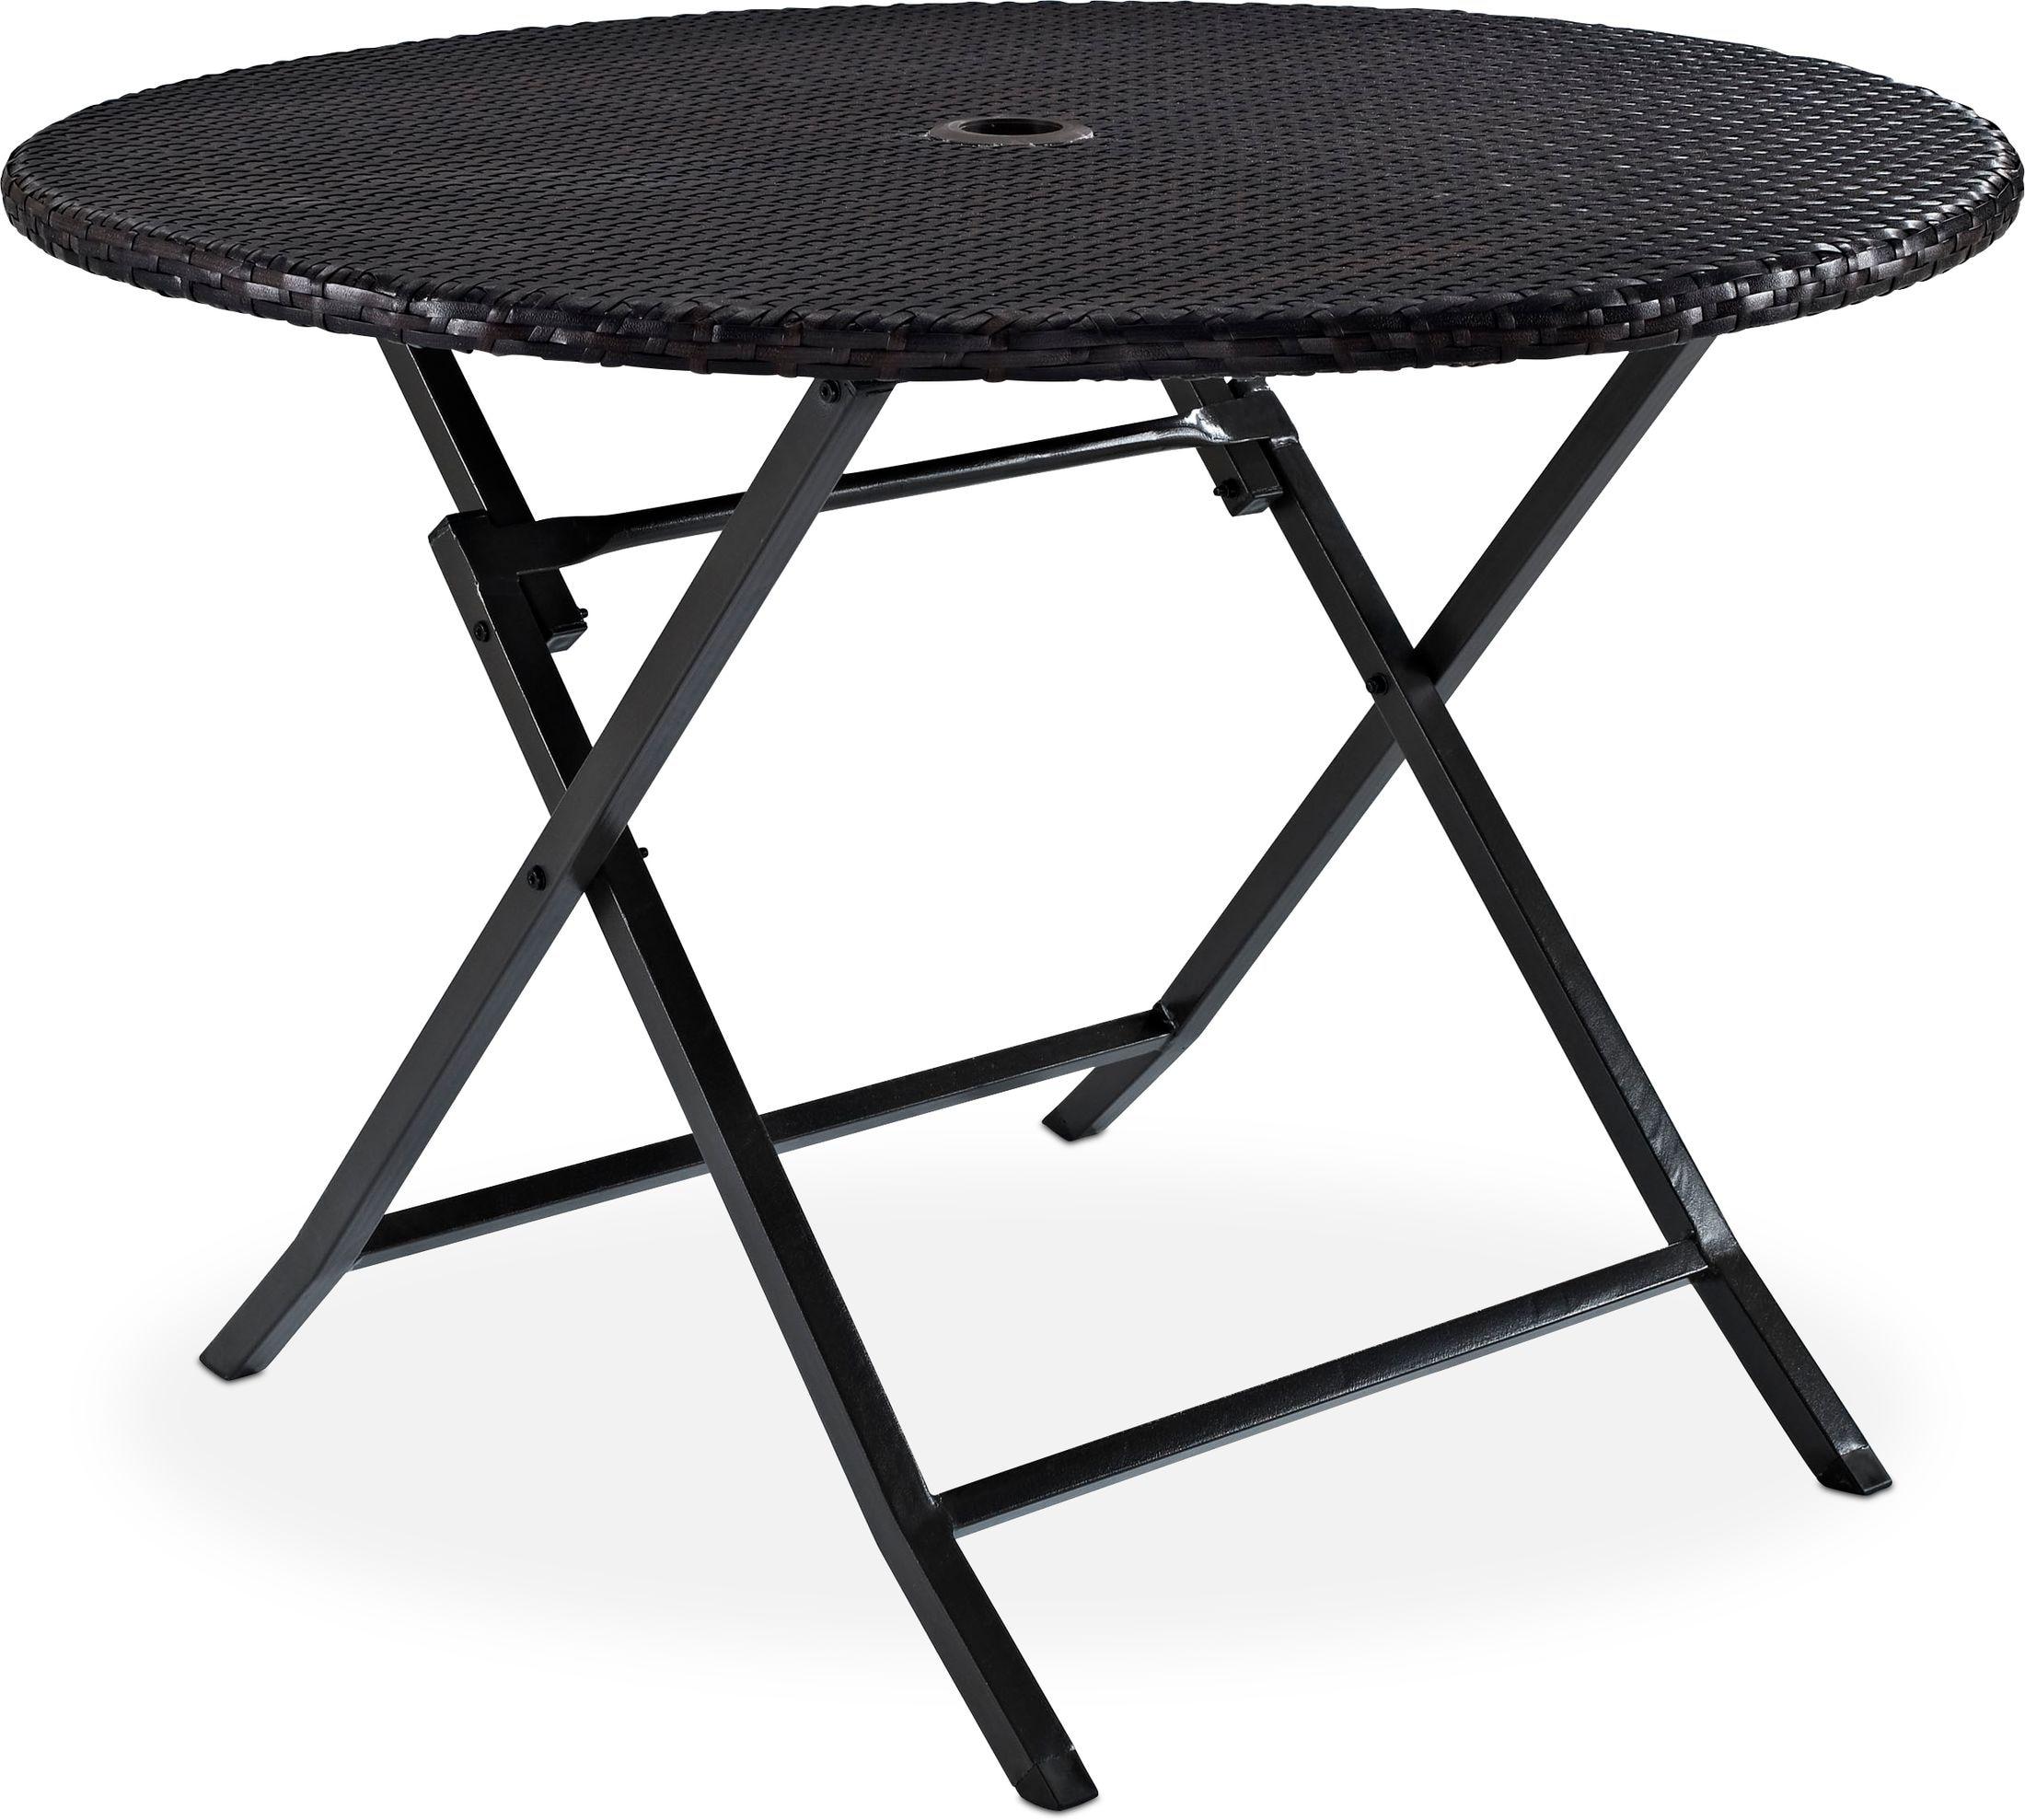 Outdoor Furniture - Aldo Outdoor Folding Table